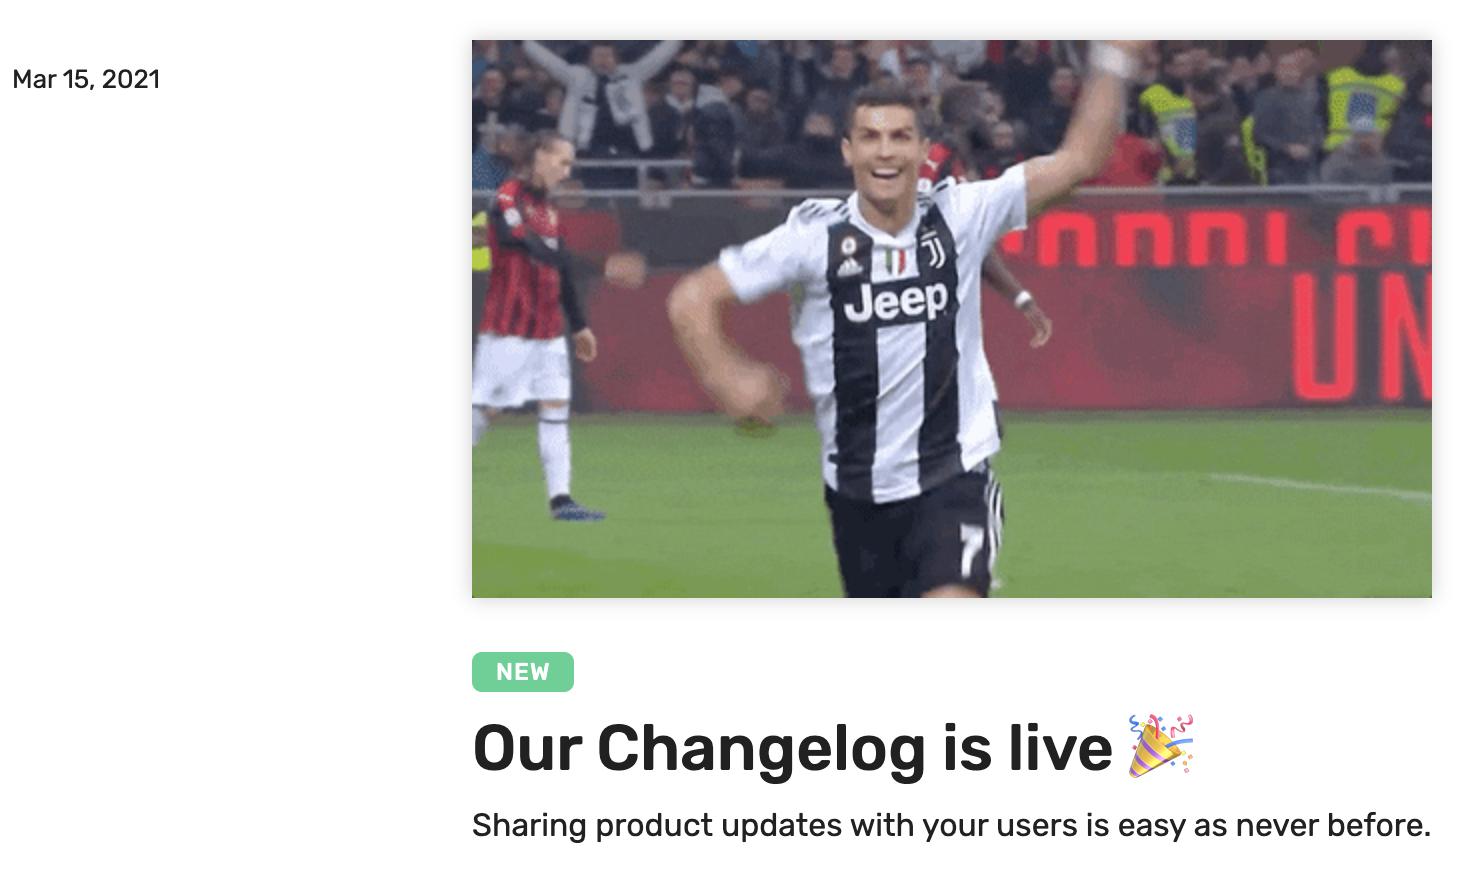 ProdCamp changelog is live